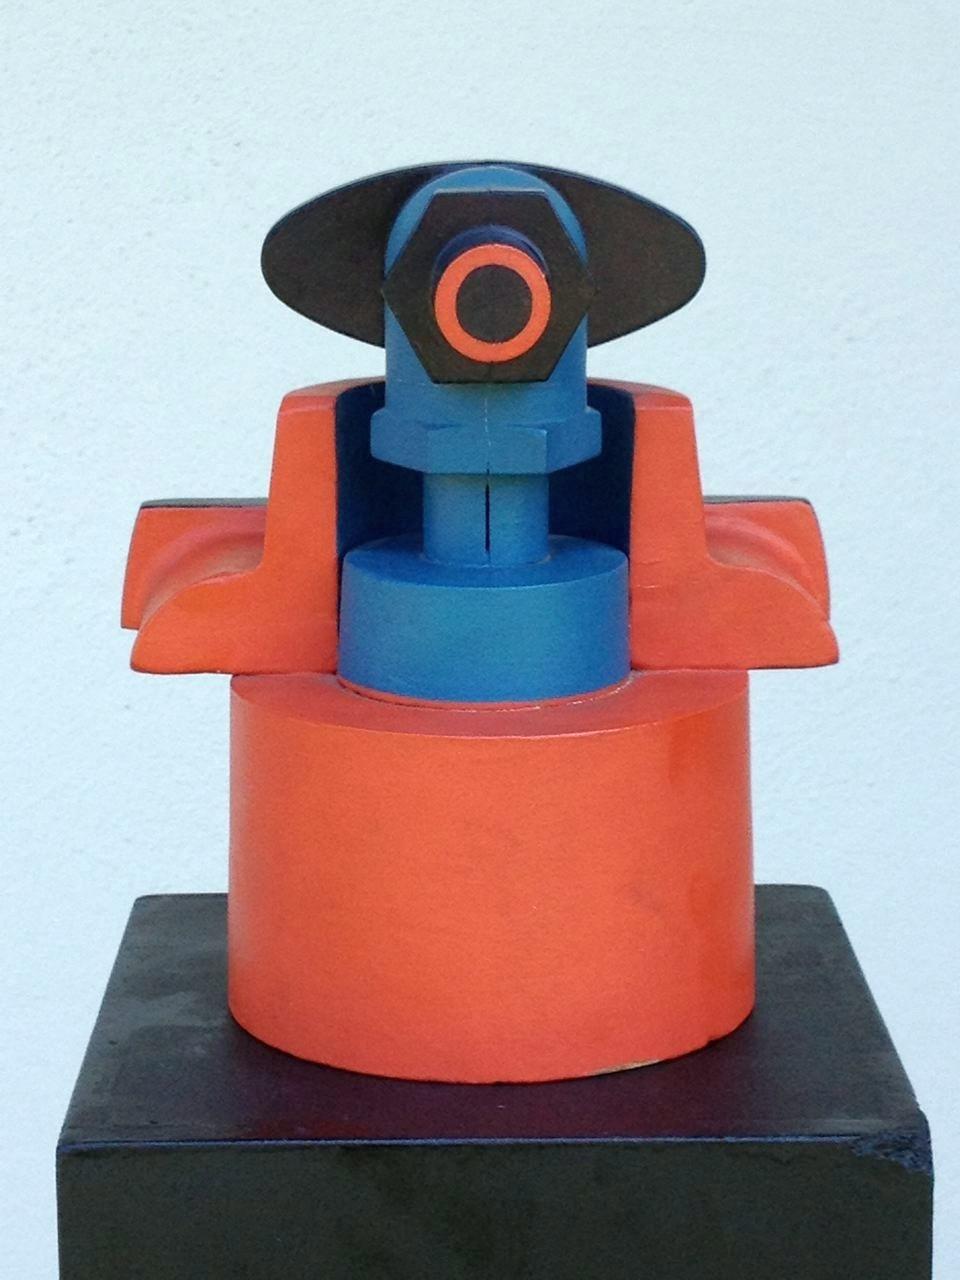 Technokrat, Holzobjekt farbig bemalt, 20 x 18 x 14 cm, 1971 (#562)